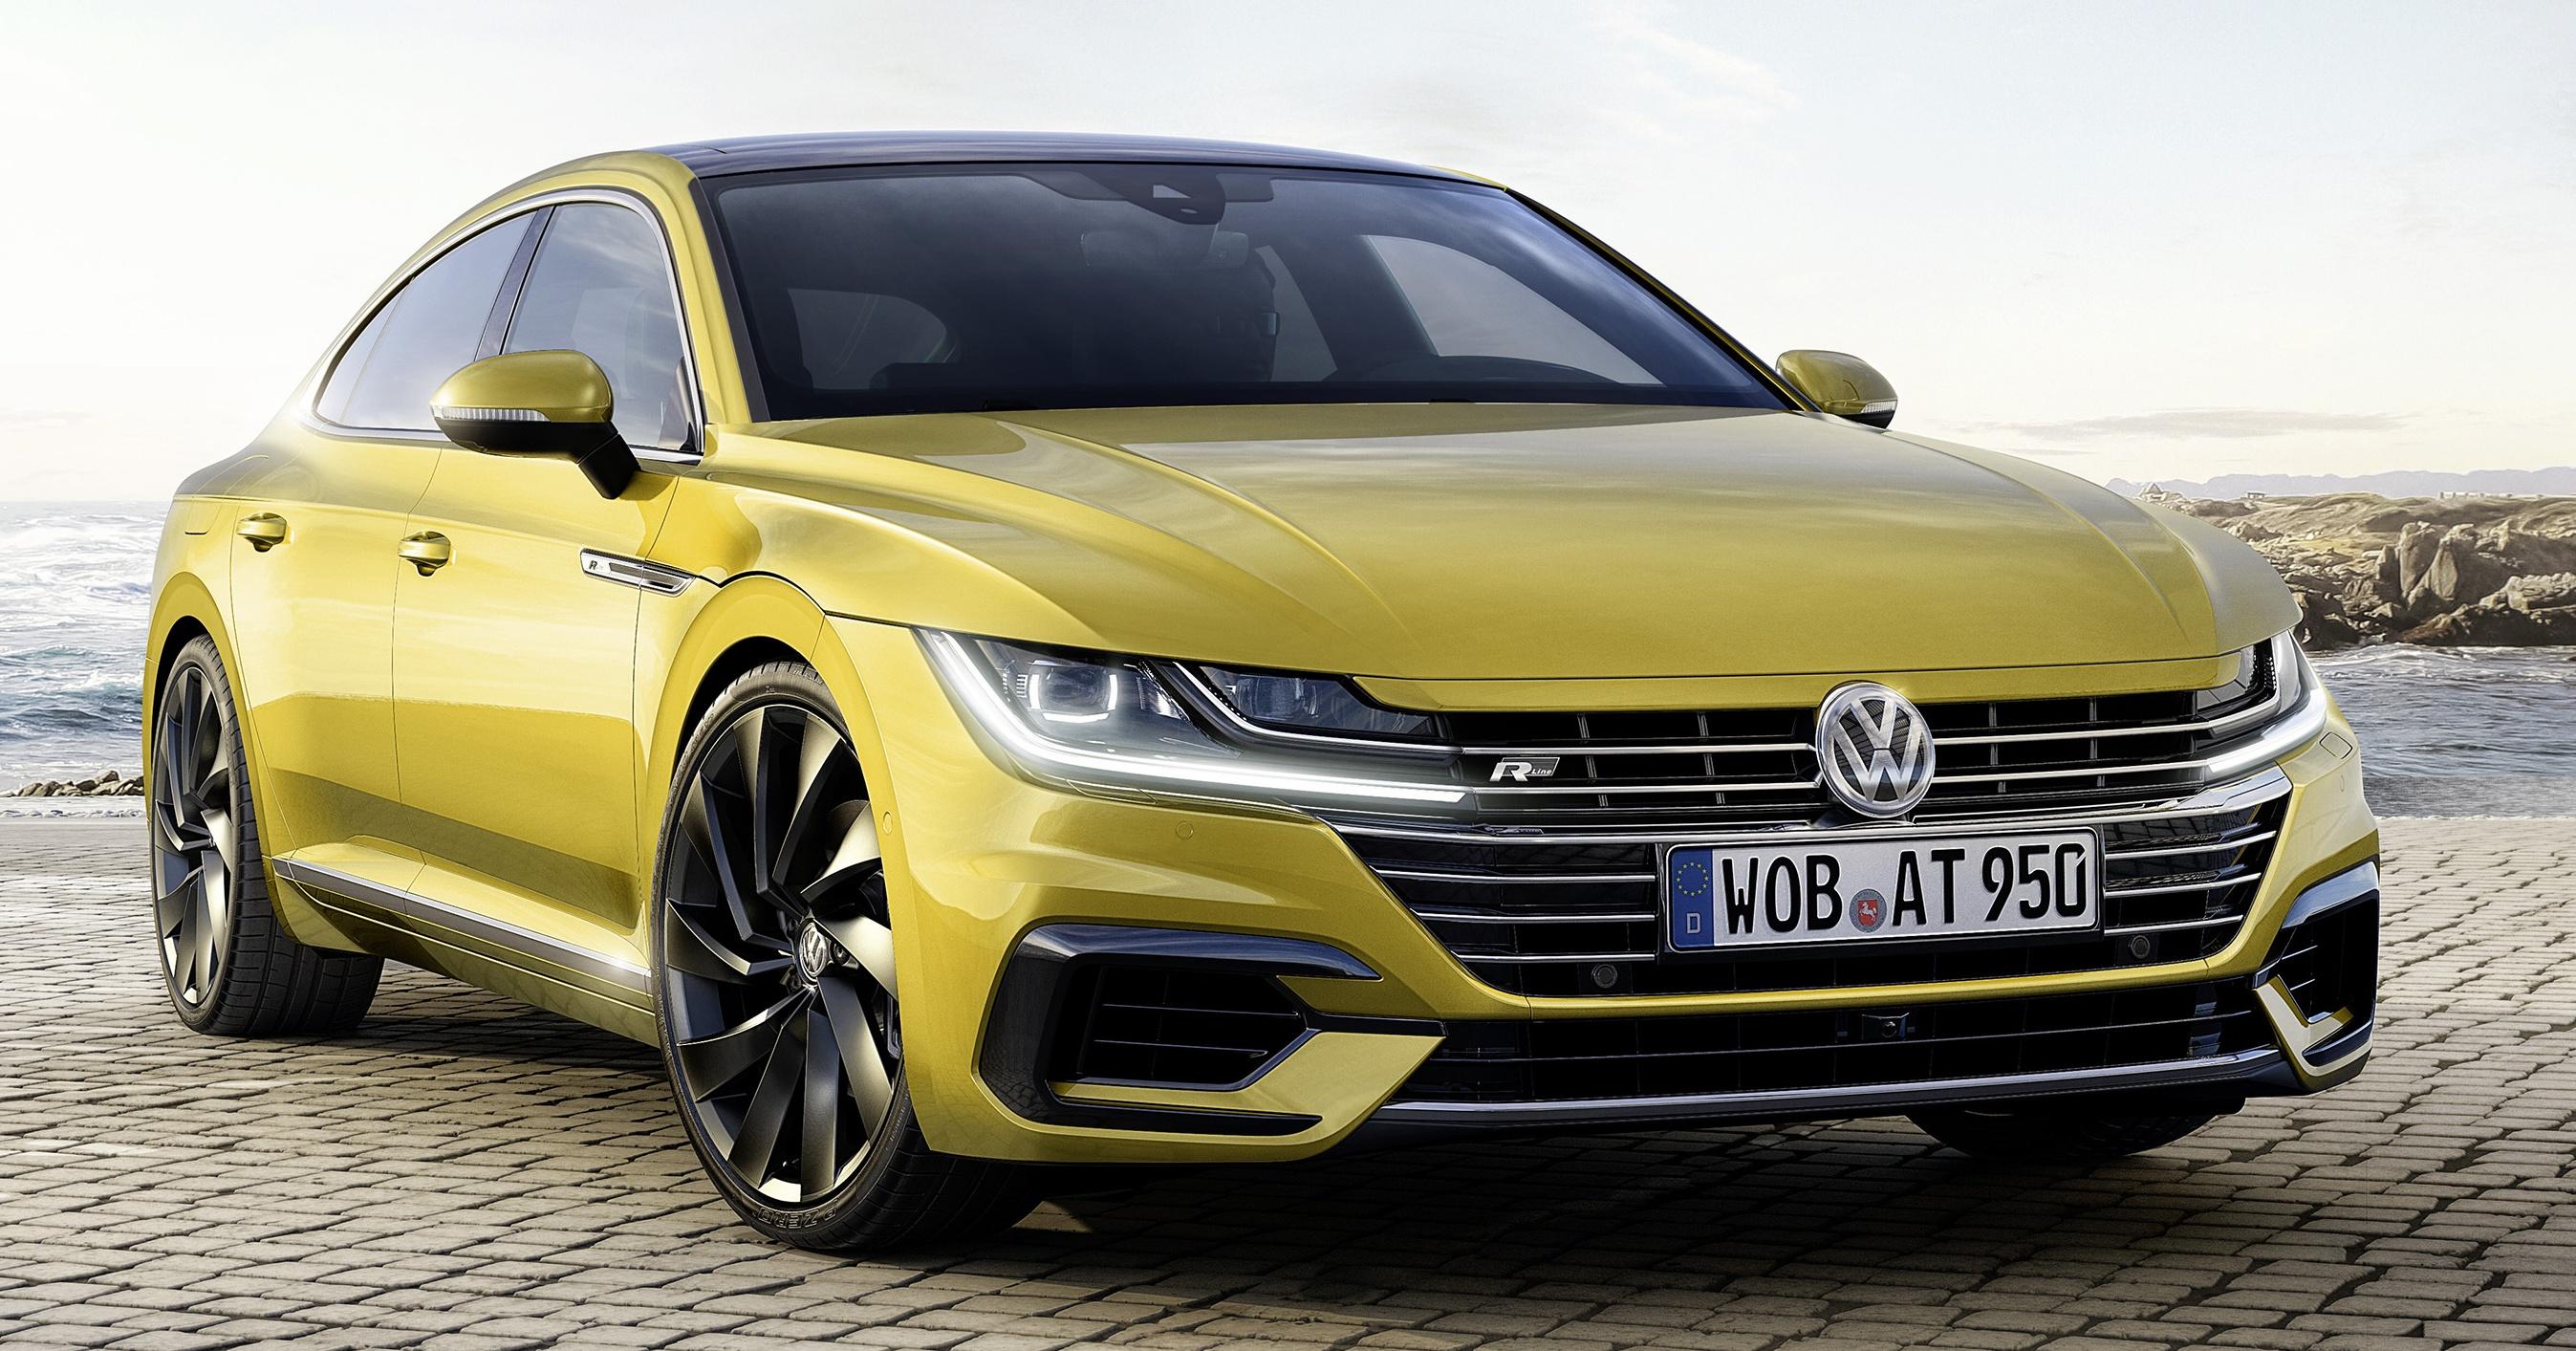 Volkswagen Arteon 日内瓦面世,CC 的后继车款。 Volkswagen ... Volkswagen Arteon